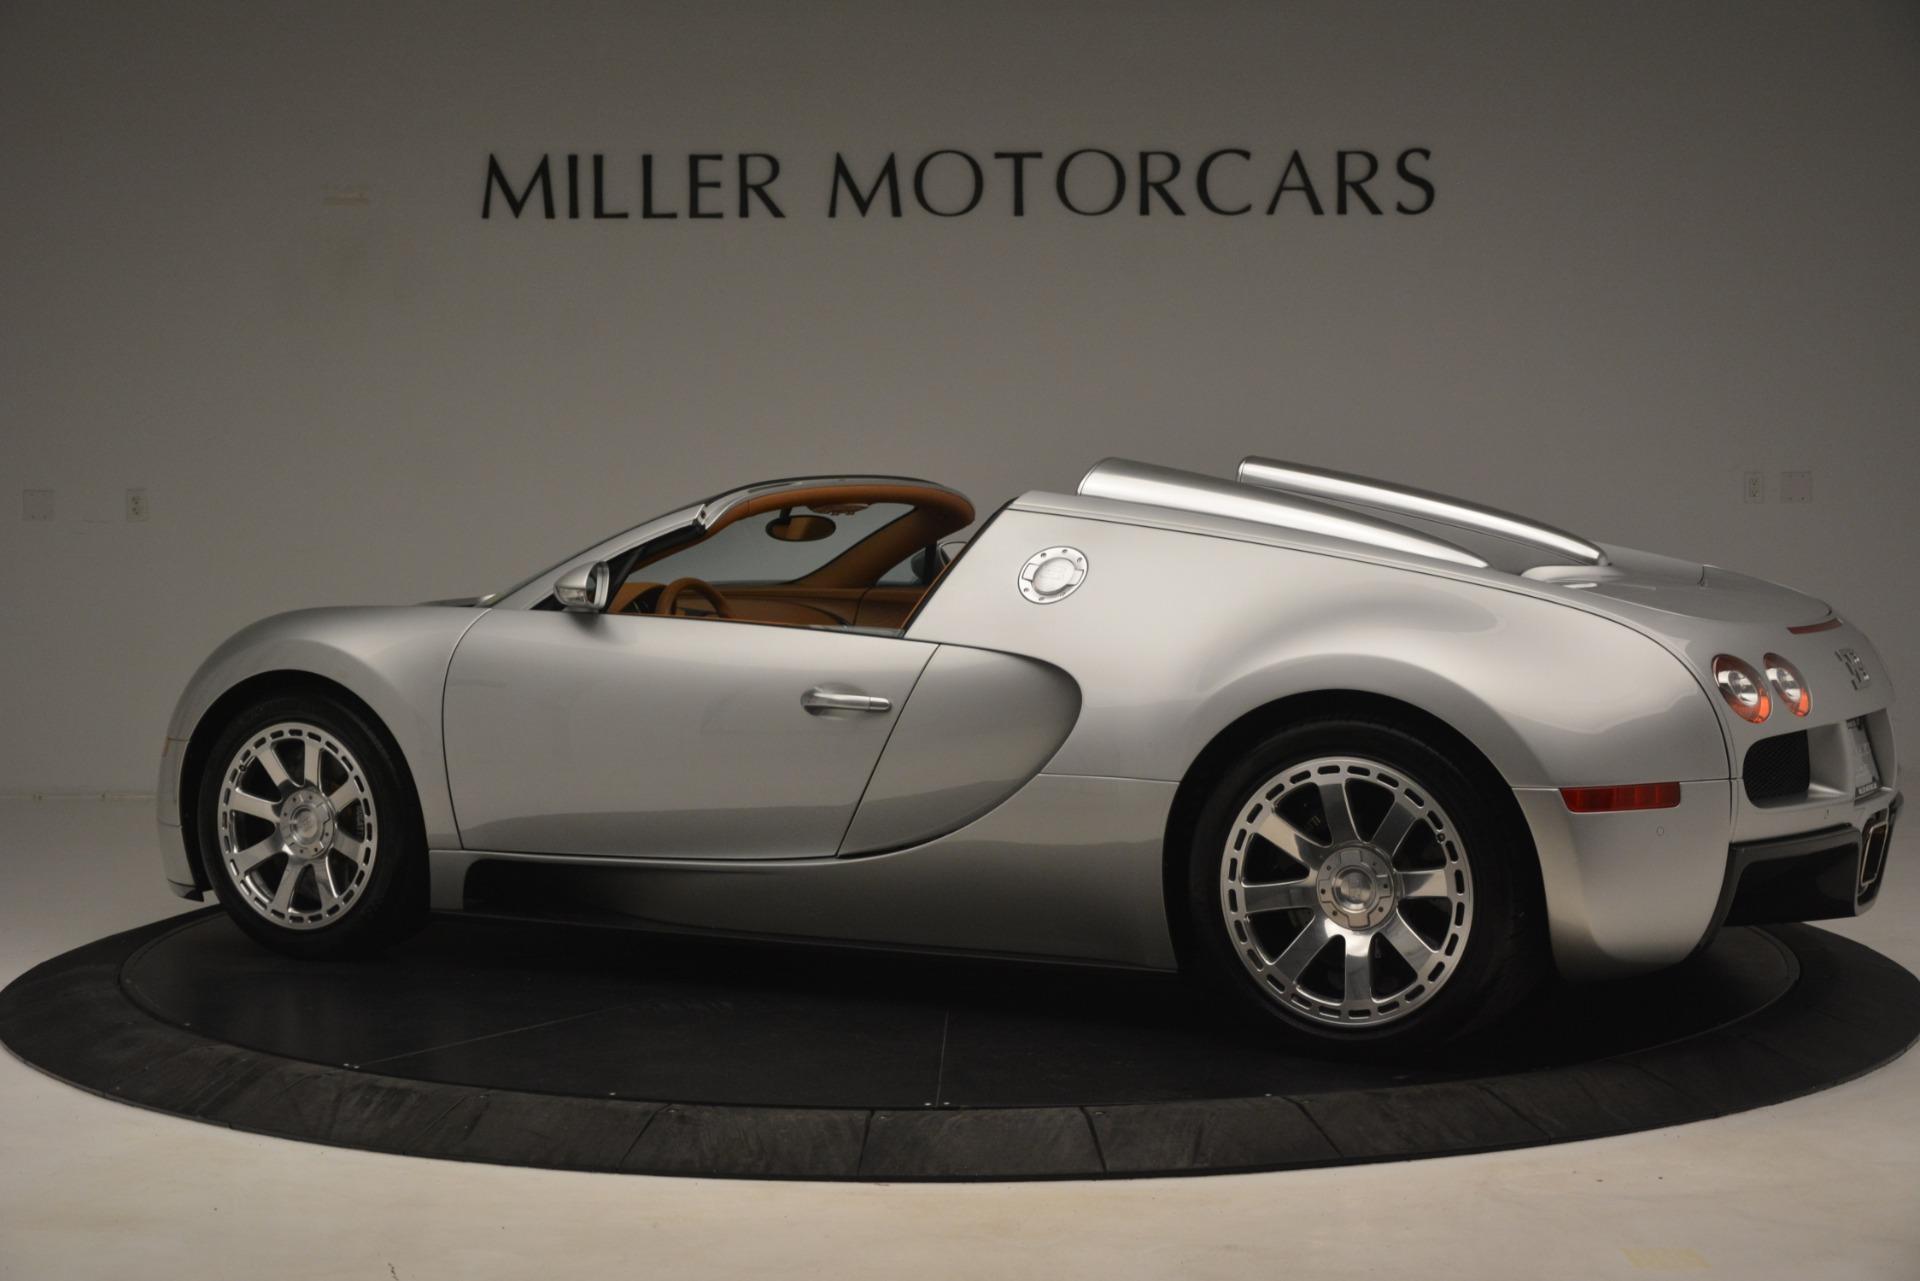 Used 2010 Bugatti Veyron 16.4 Grand Sport For Sale In Greenwich, CT 3159_p5